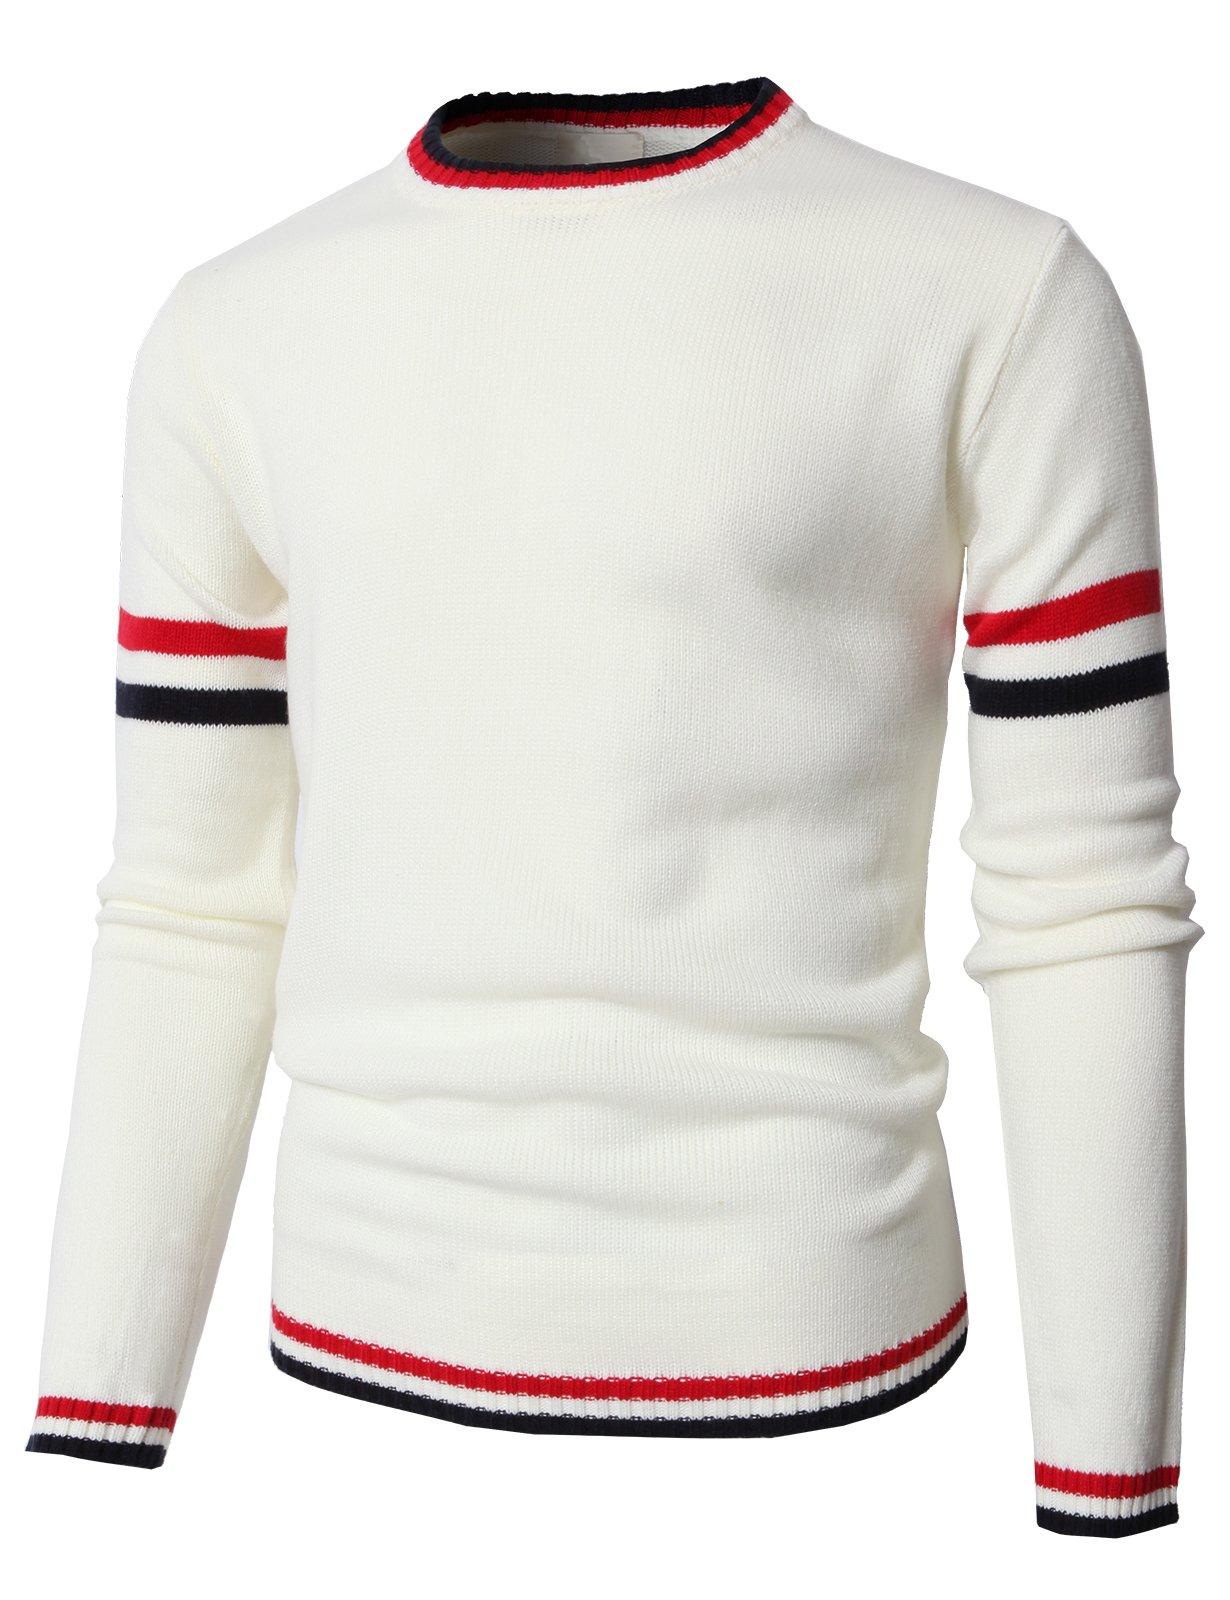 H2H Mens Fashion Slim Fit Stripe Crewneck Pullover Jumper Sweaters Ivory US L/Asia XL (KMOSWL0194)